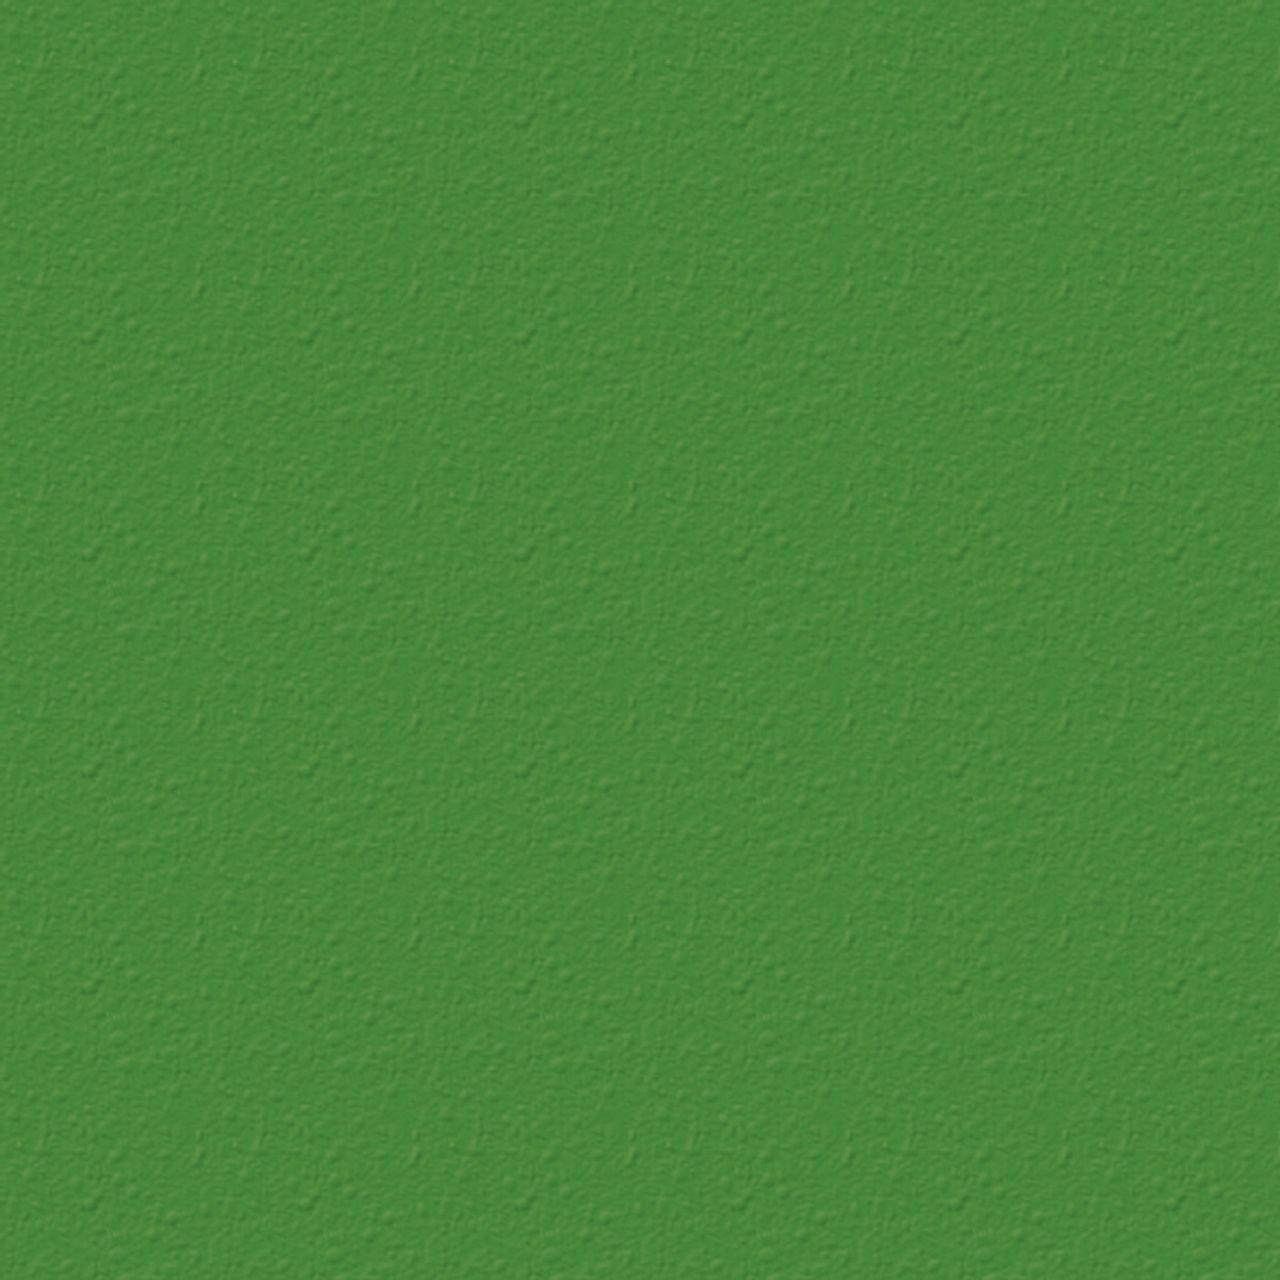 K36.3.5 Turf Green